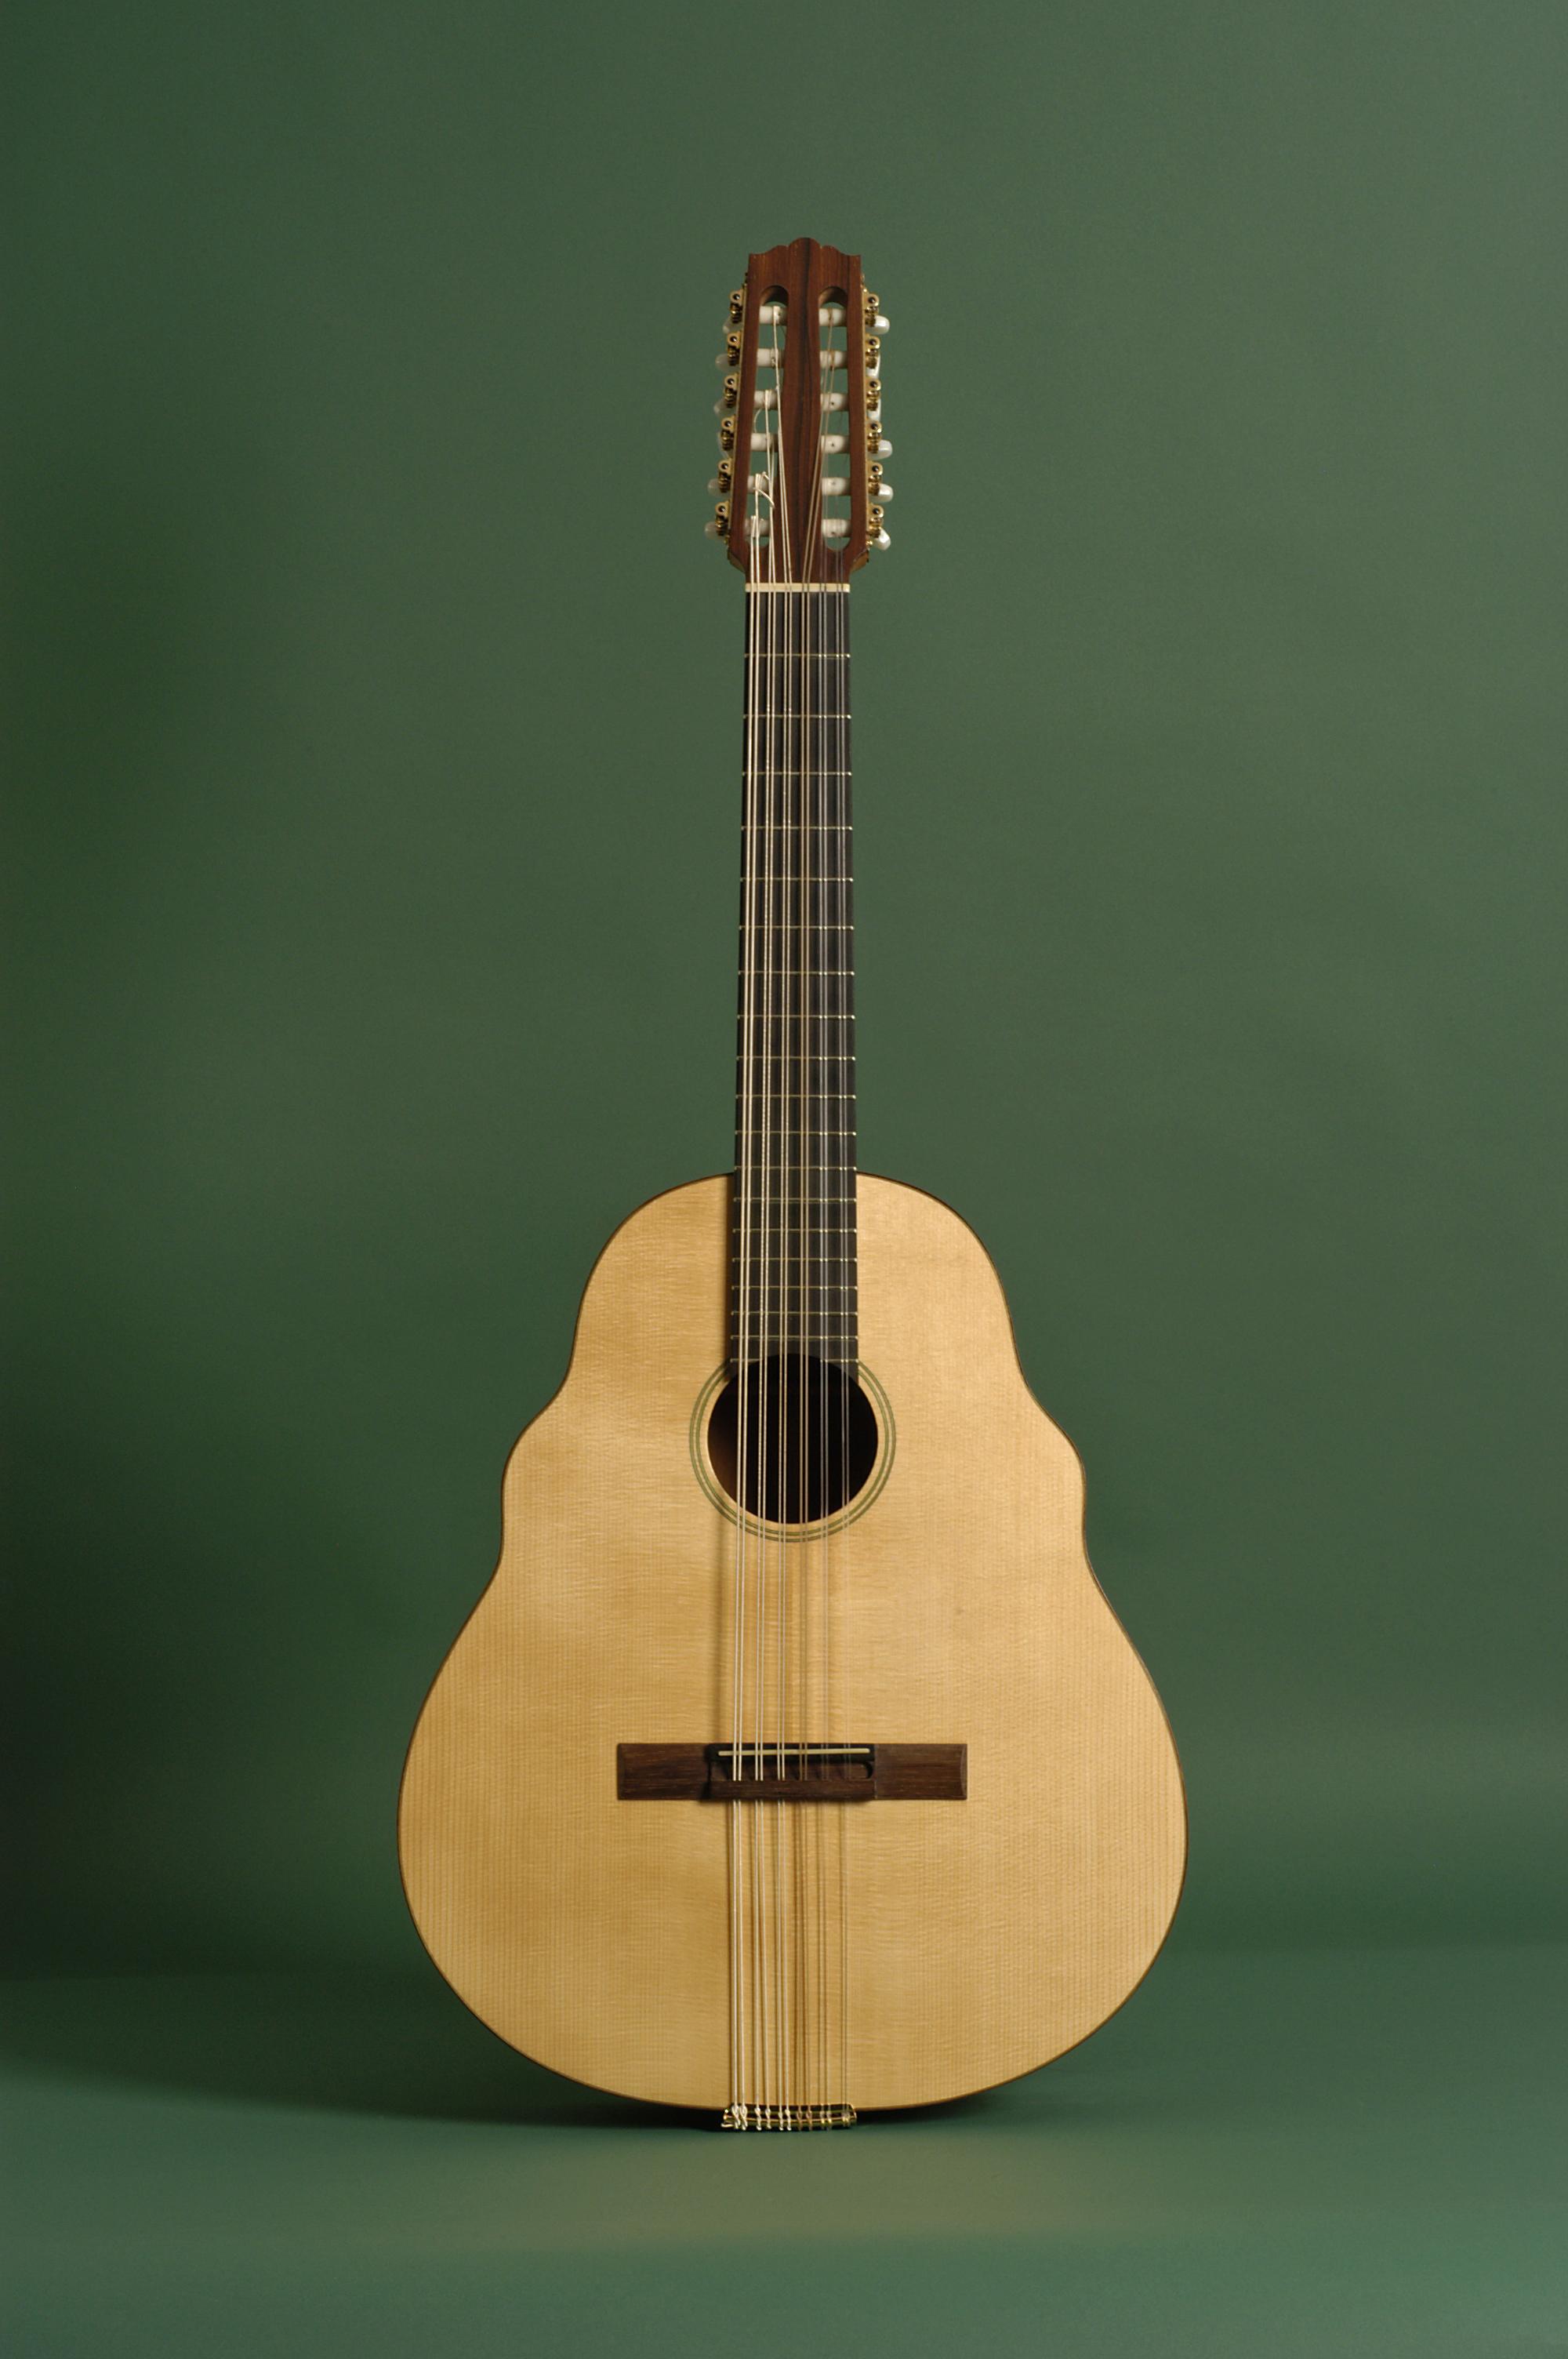 flip_guitar_image_12A.jpg